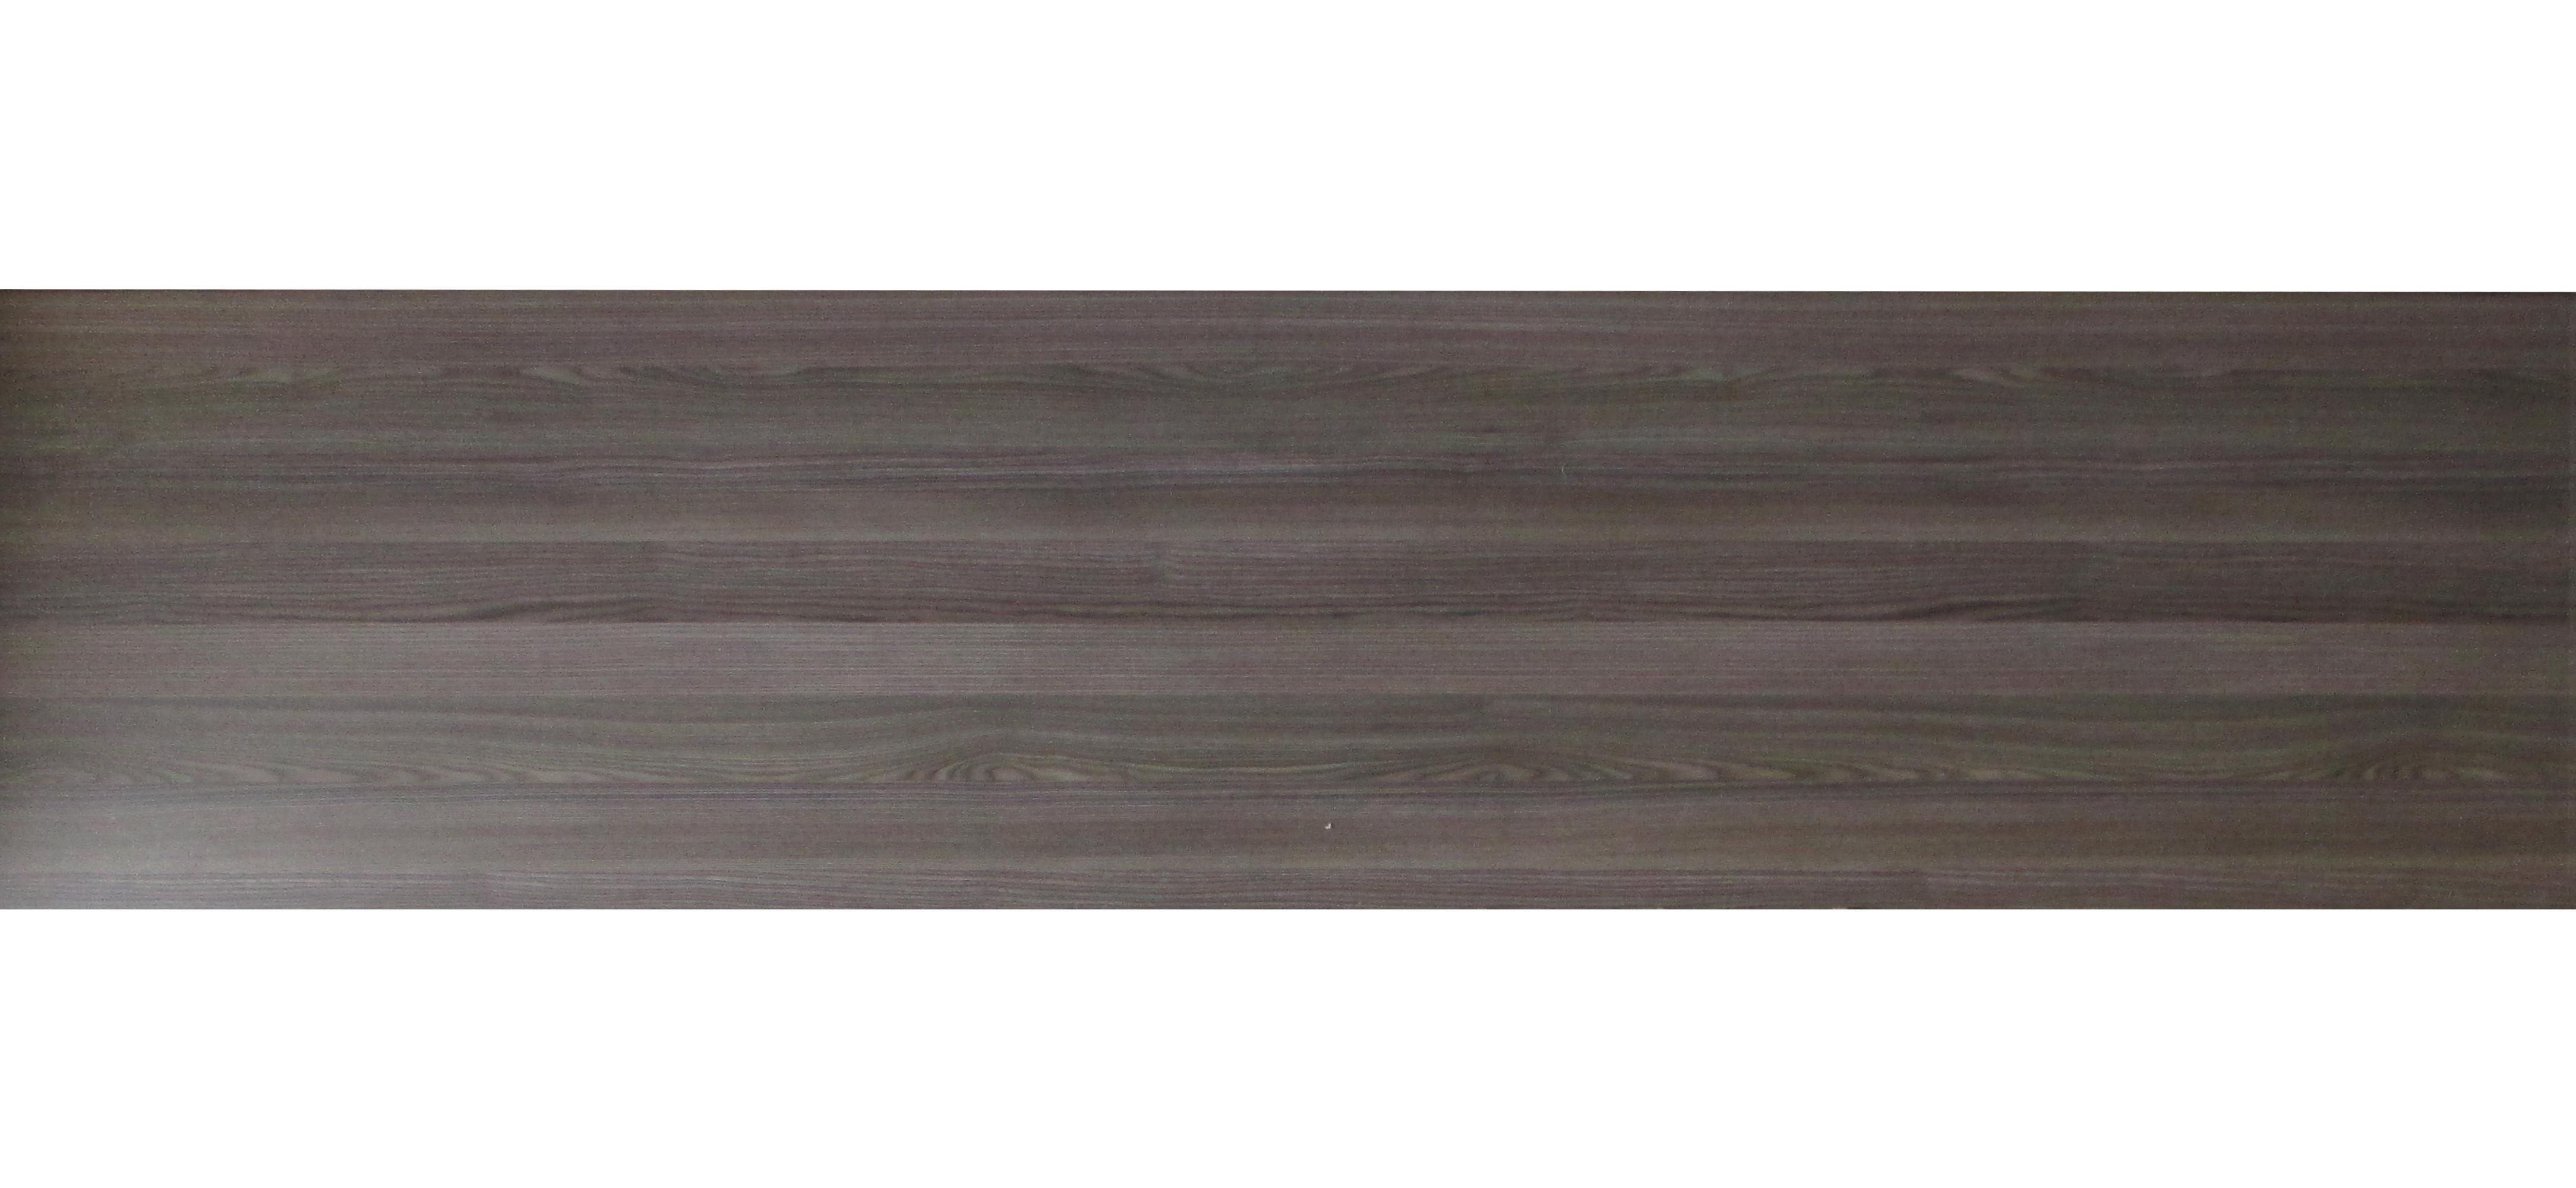 ikea prägel arbeitsplatte graubraun 246cm x 62cm 002.038.37-00203837